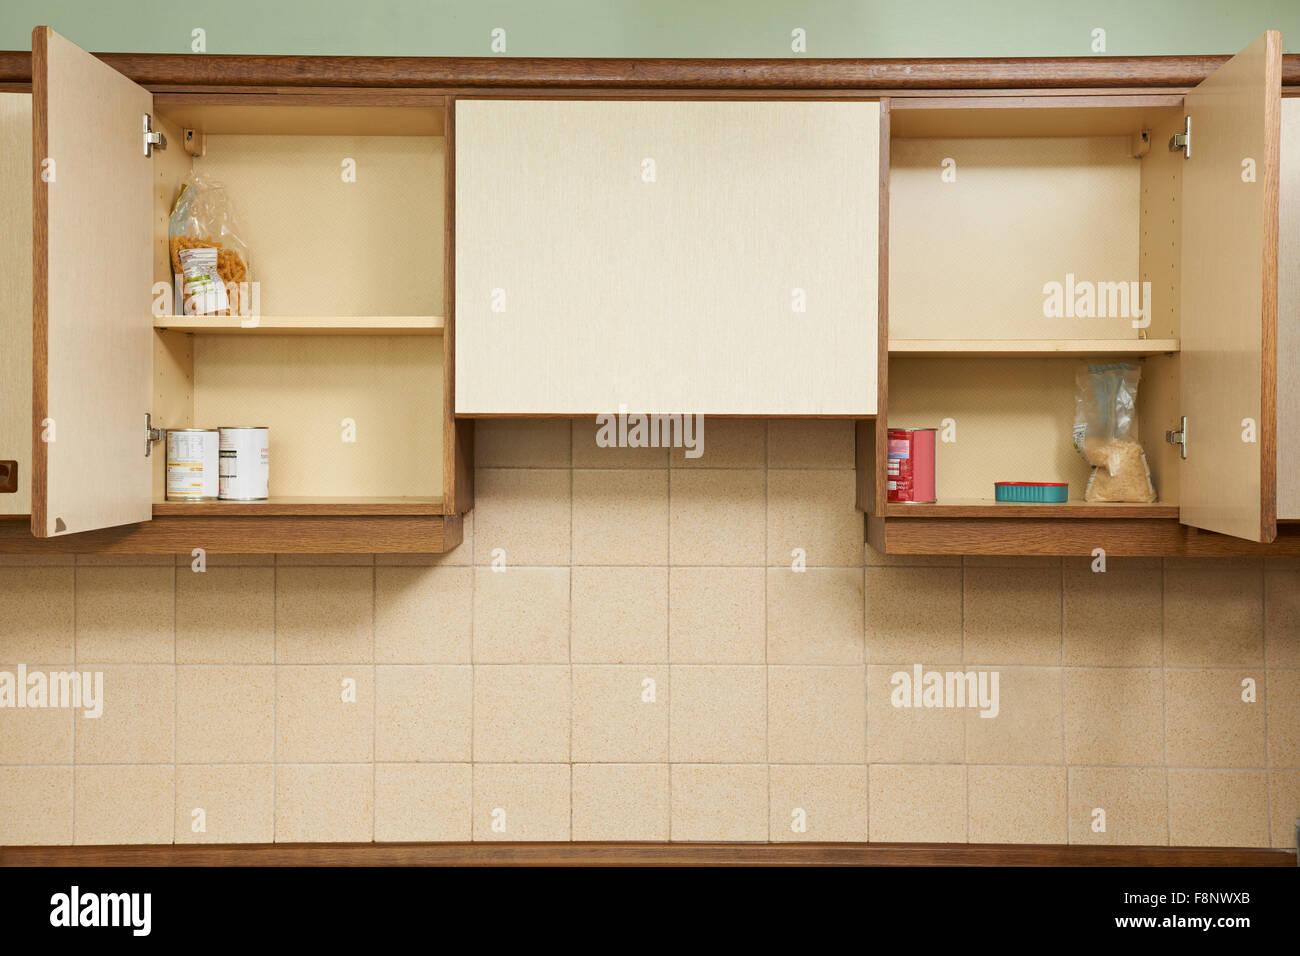 Leeren Küchenschränke Stockfoto, Bild: 91450419 - Alamy